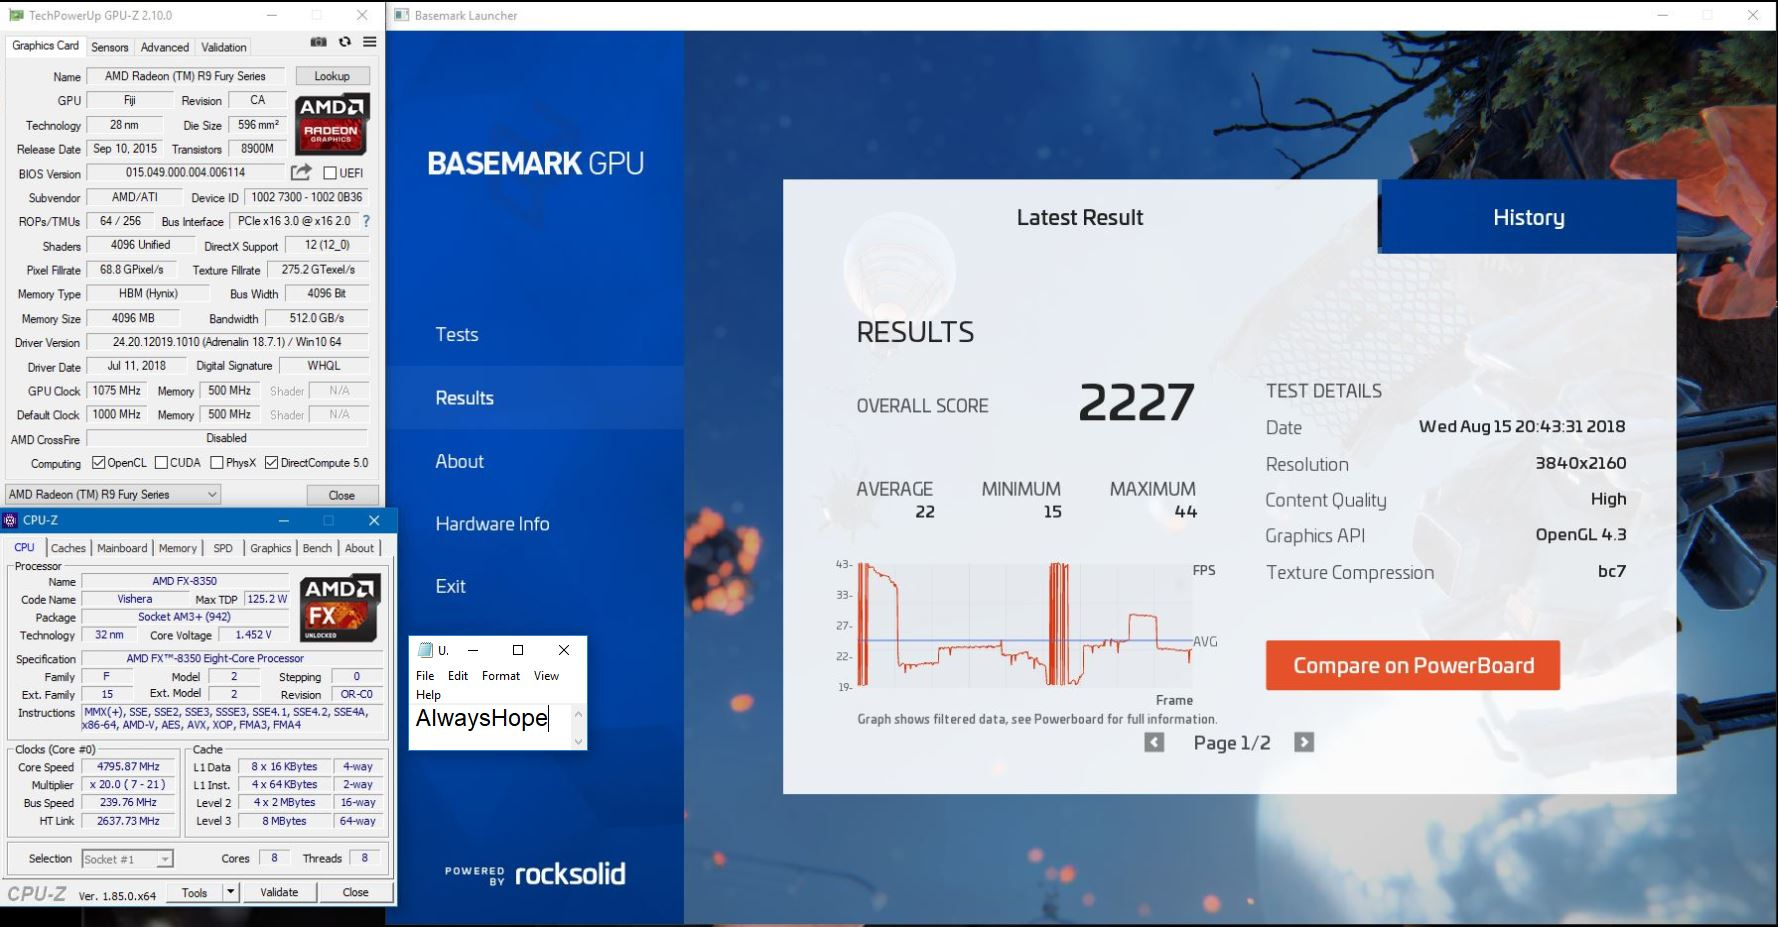 BasemarkGPUa_openGL_4.8GHz.JPG